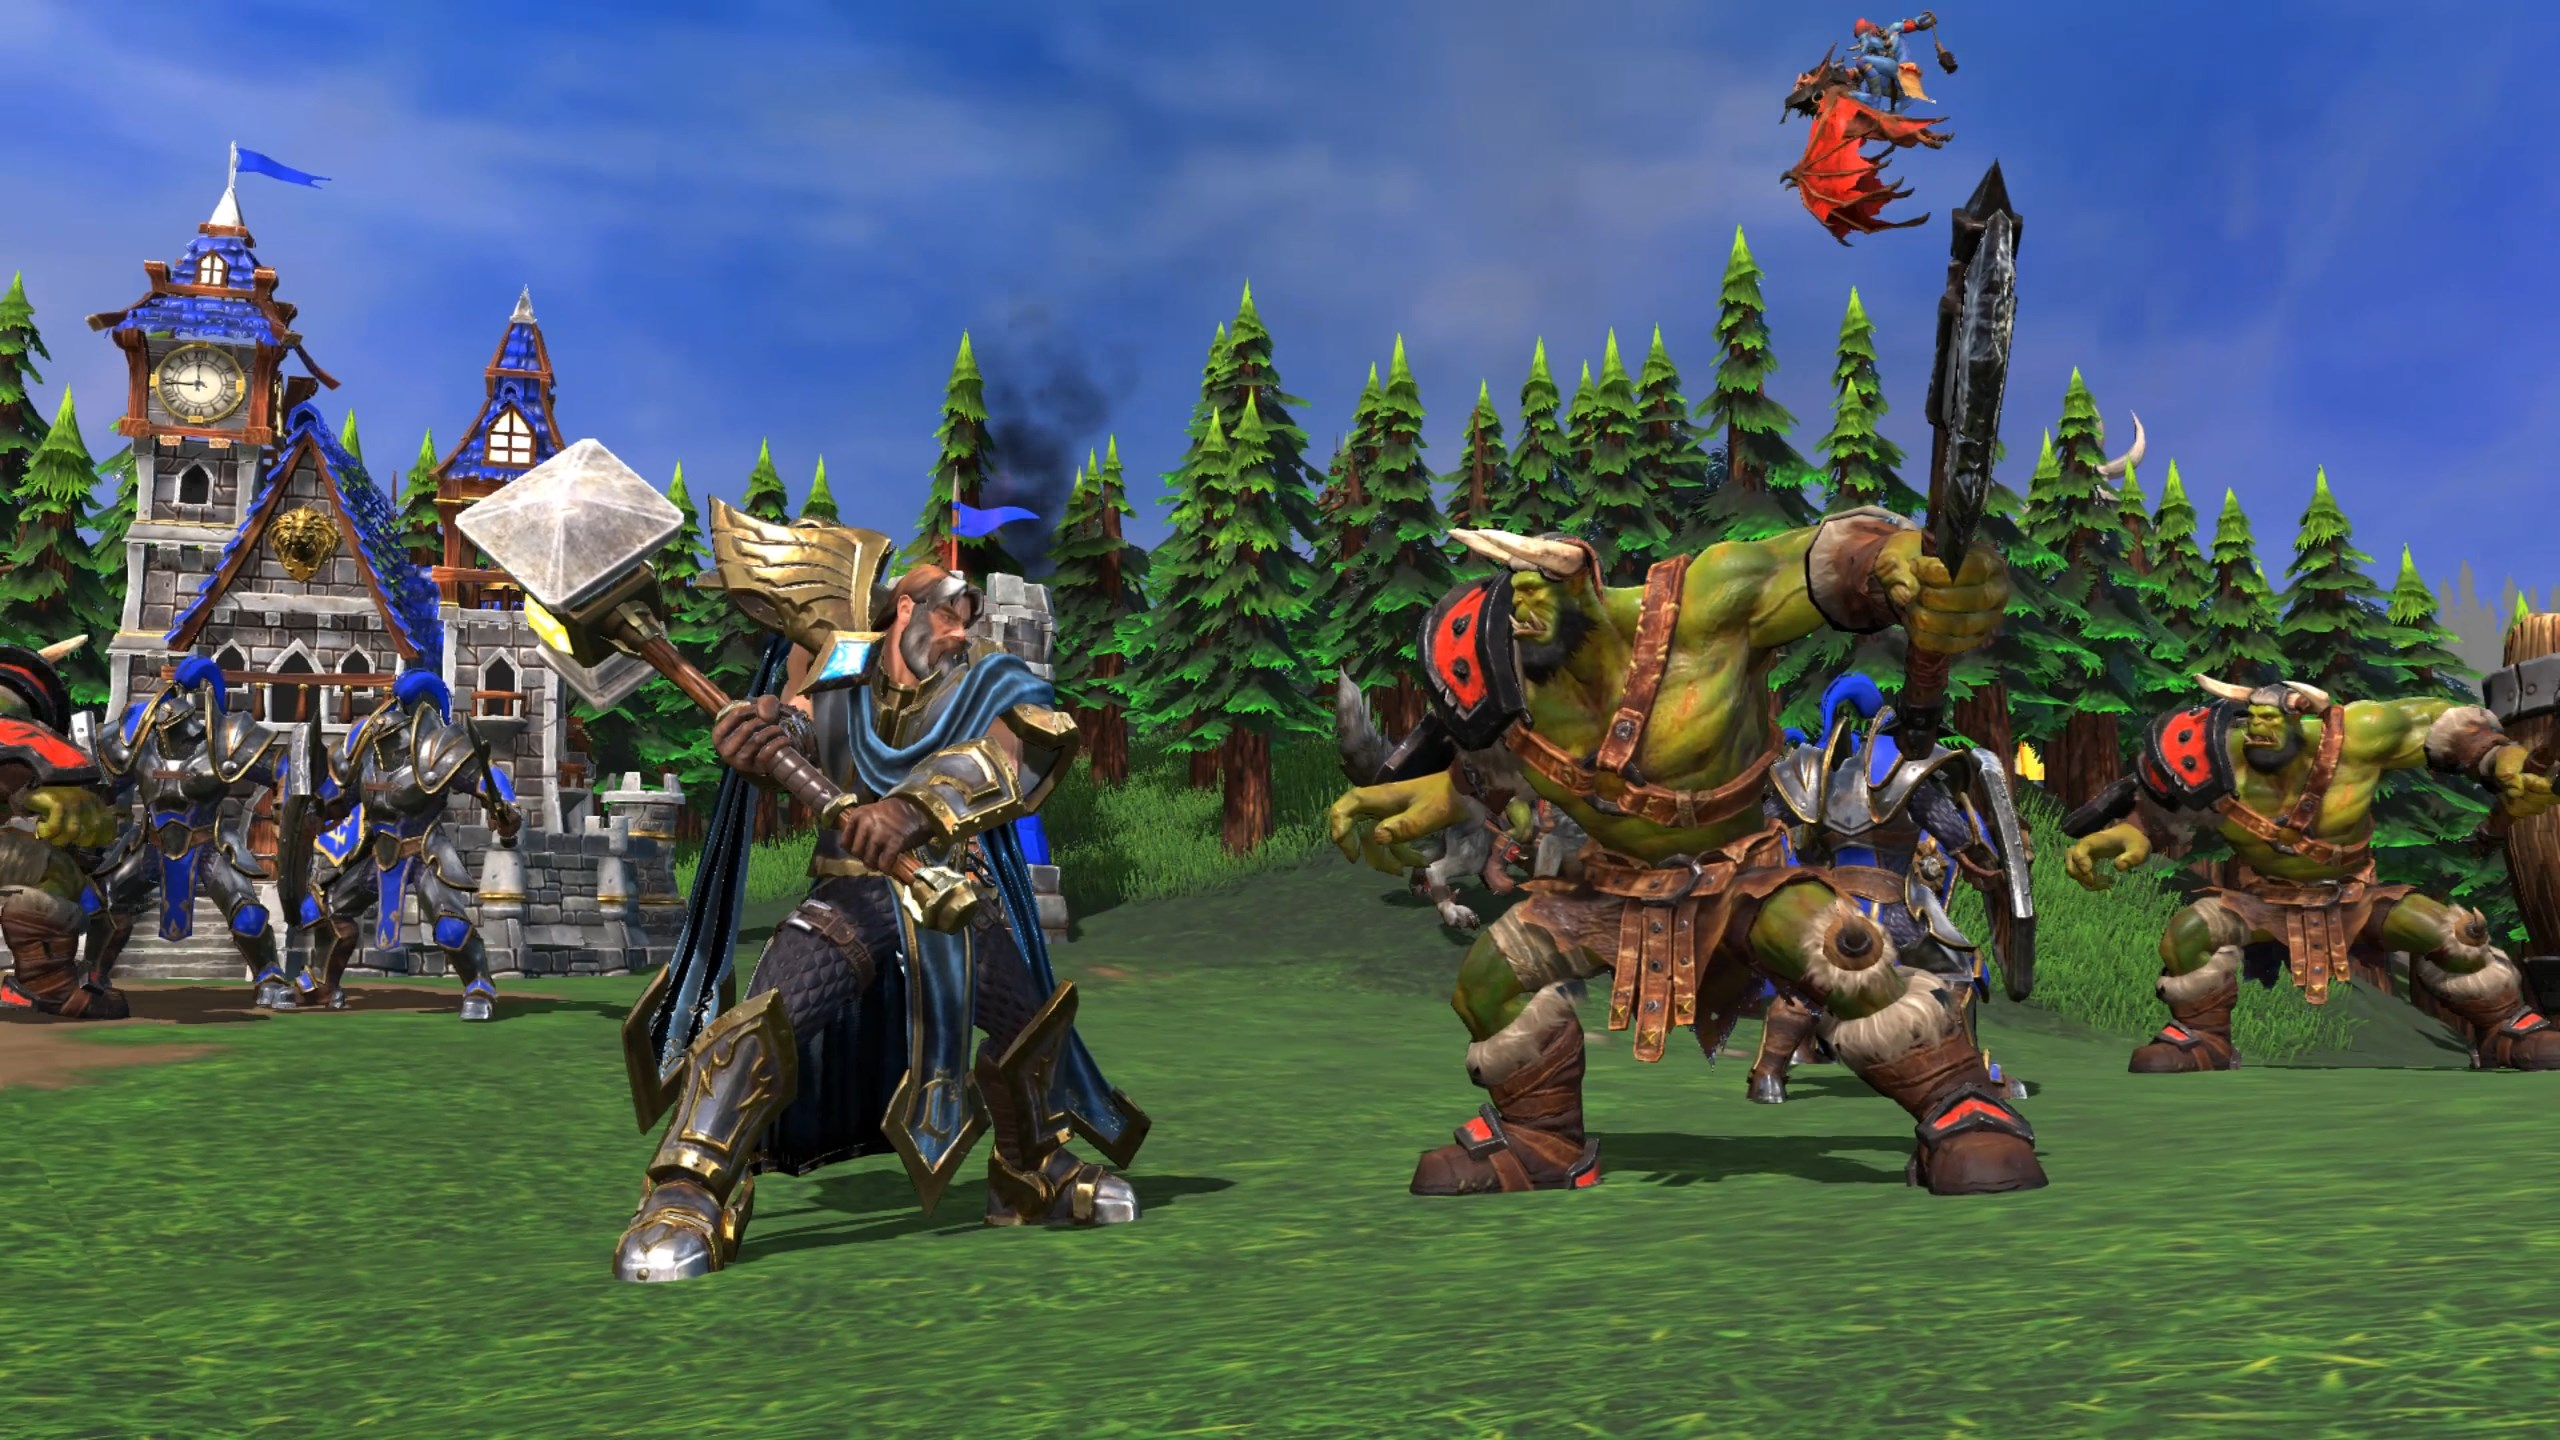 Warcraft 3 release date in Brisbane